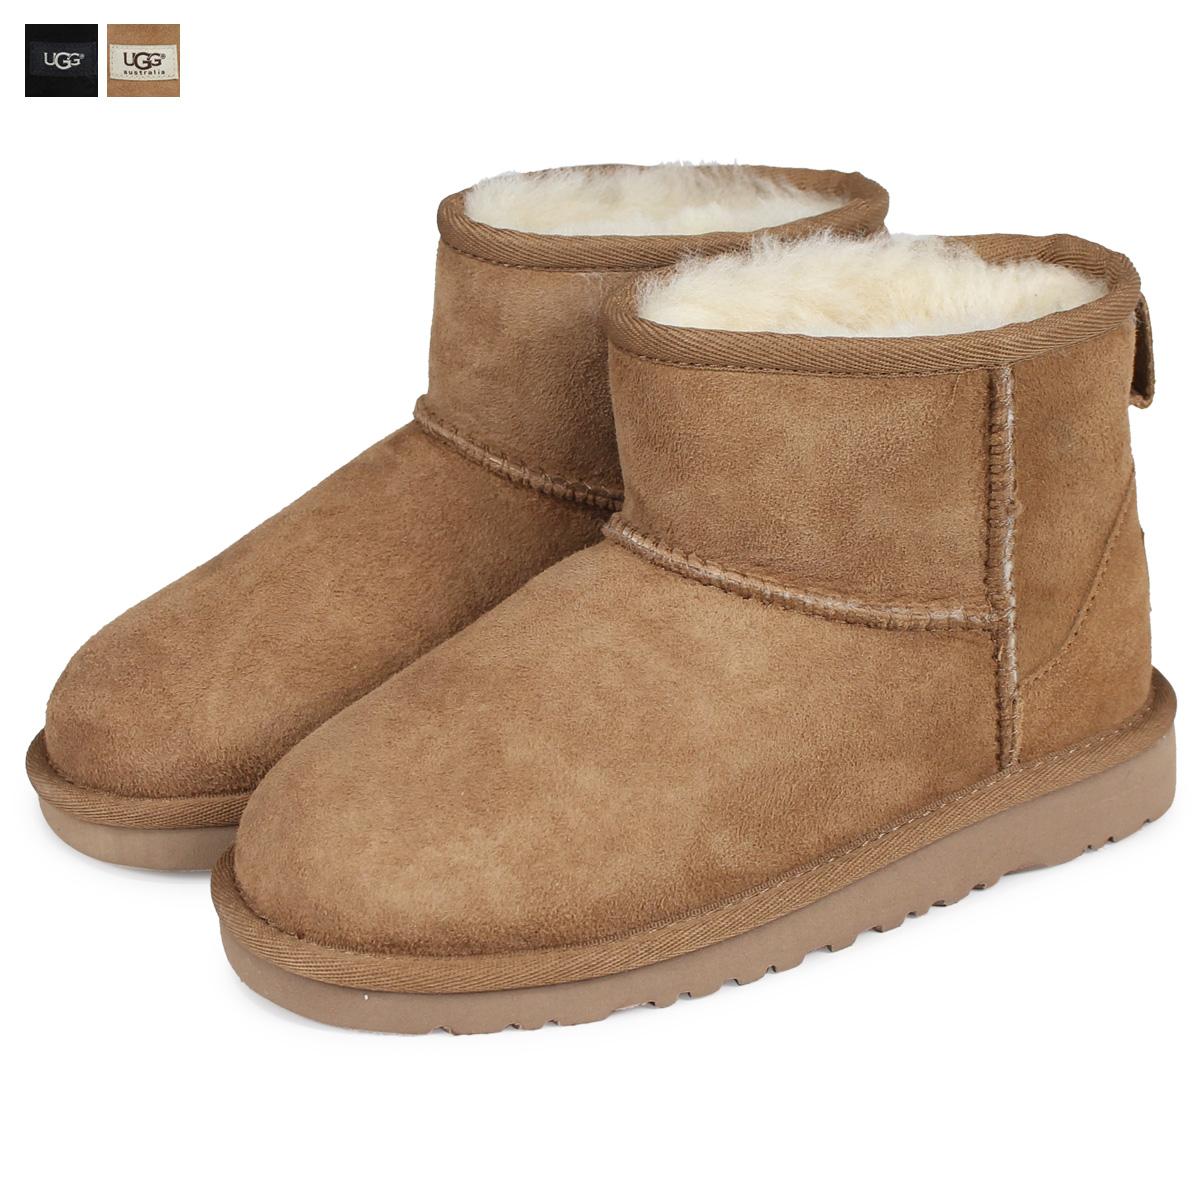 11a9b651697 UGG Ugg Classic mini Sheepskin boots kids KIDS CLASSIC MINI 1003637 K  Sheepskin ladies